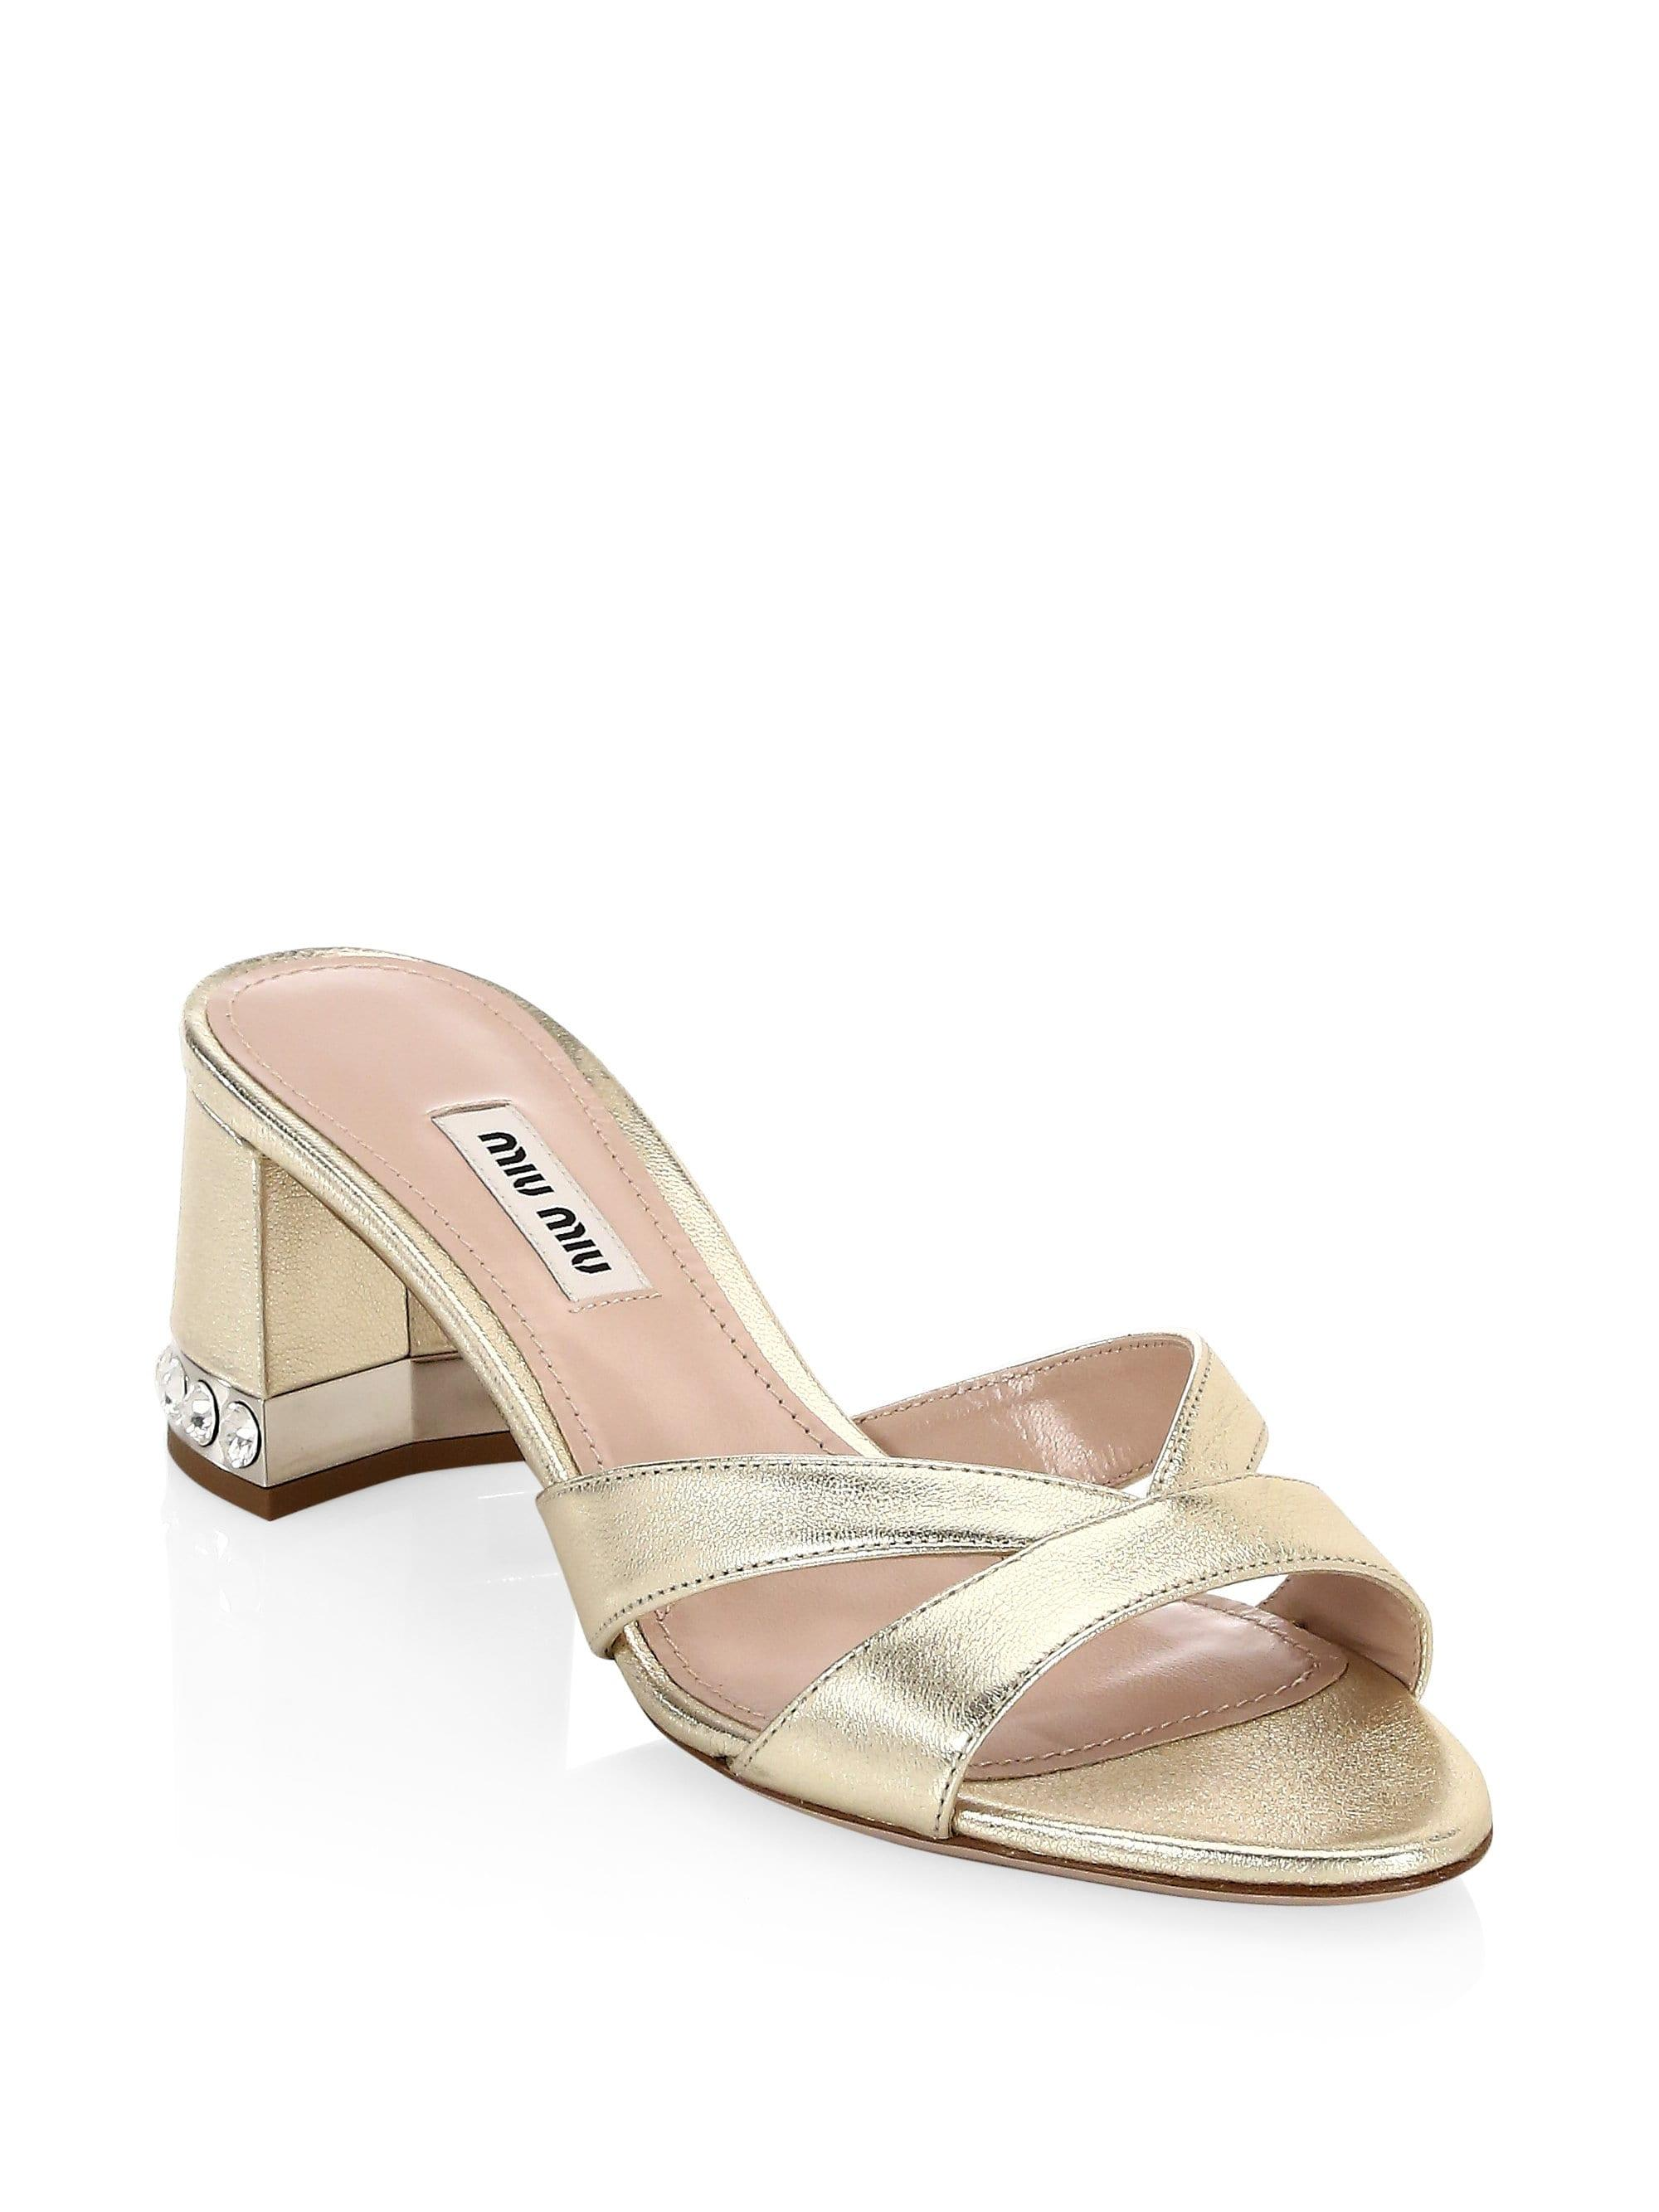 2c9485c68f918c Lyst - Miu Miu Women s Metallic Crystal Block Heel Sandals - Gold ...